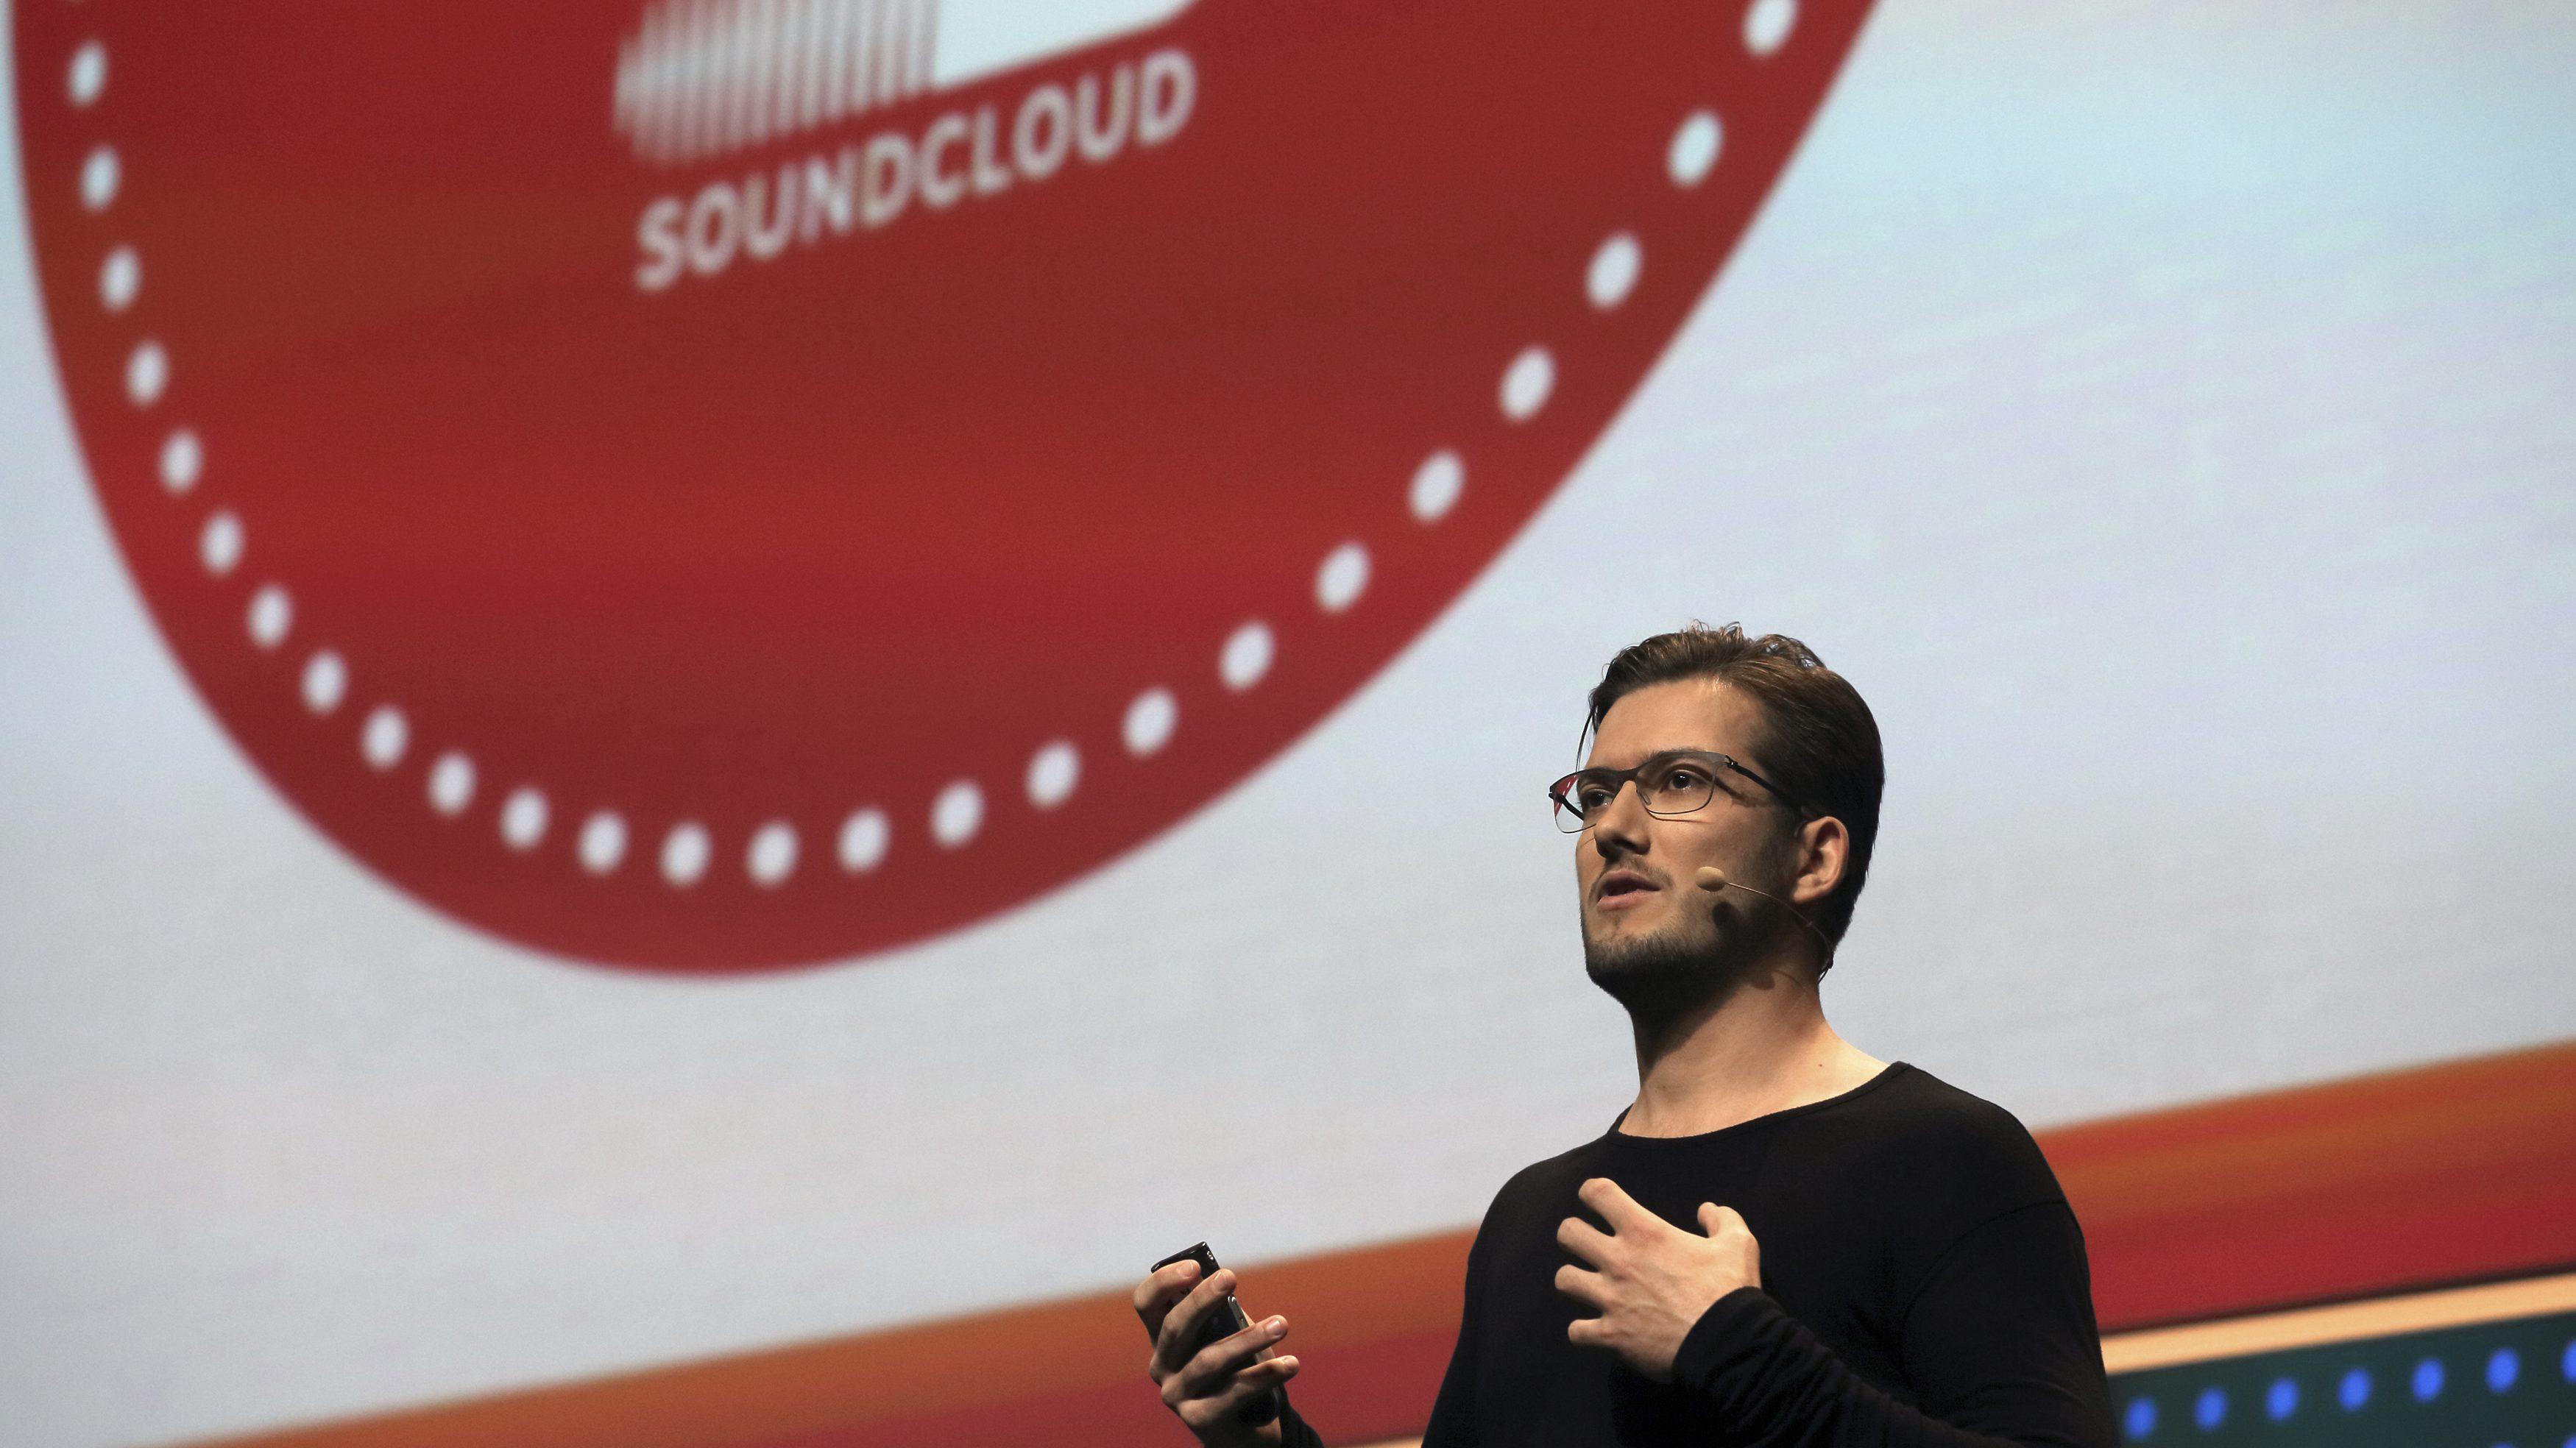 Berlin's SoundCloud CEO Alexander Ljung attends the LeWeb technology conference near Paris